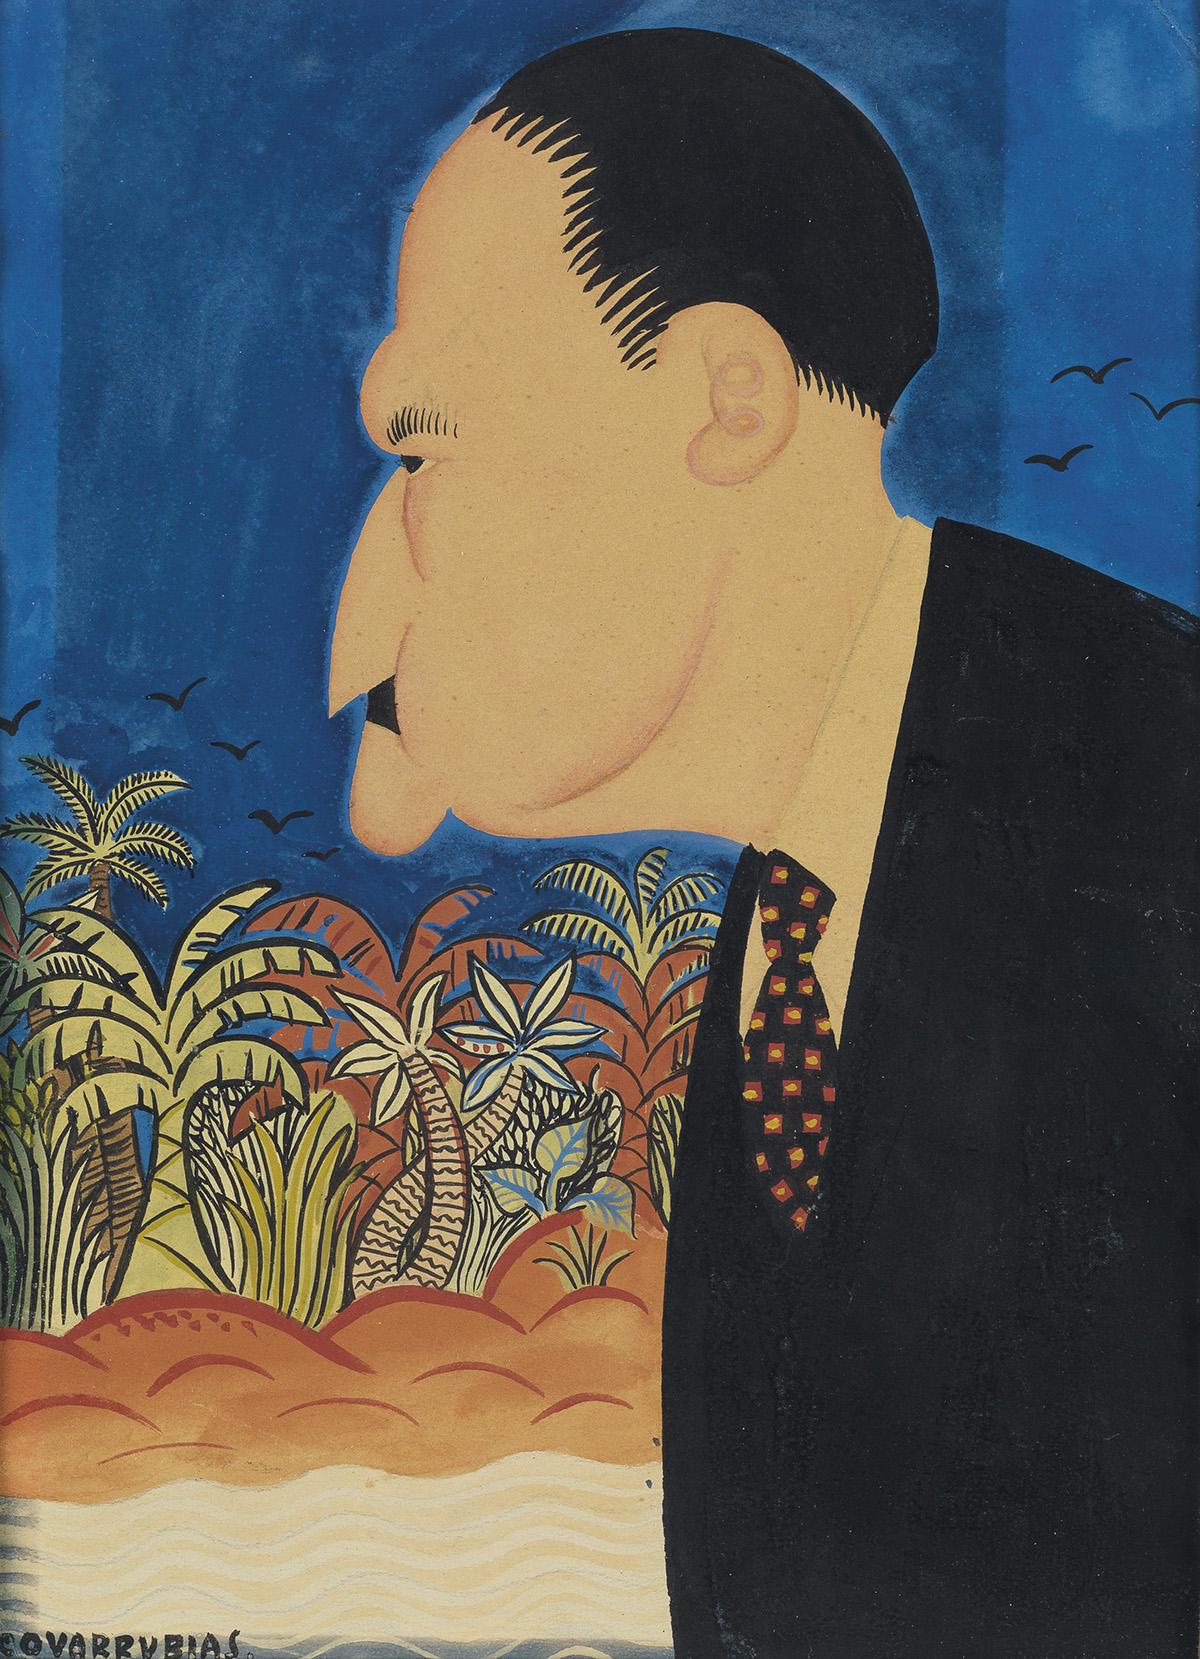 MIGUEL-COVARRUBIAS-Portrait-of-Somerset-Maugham